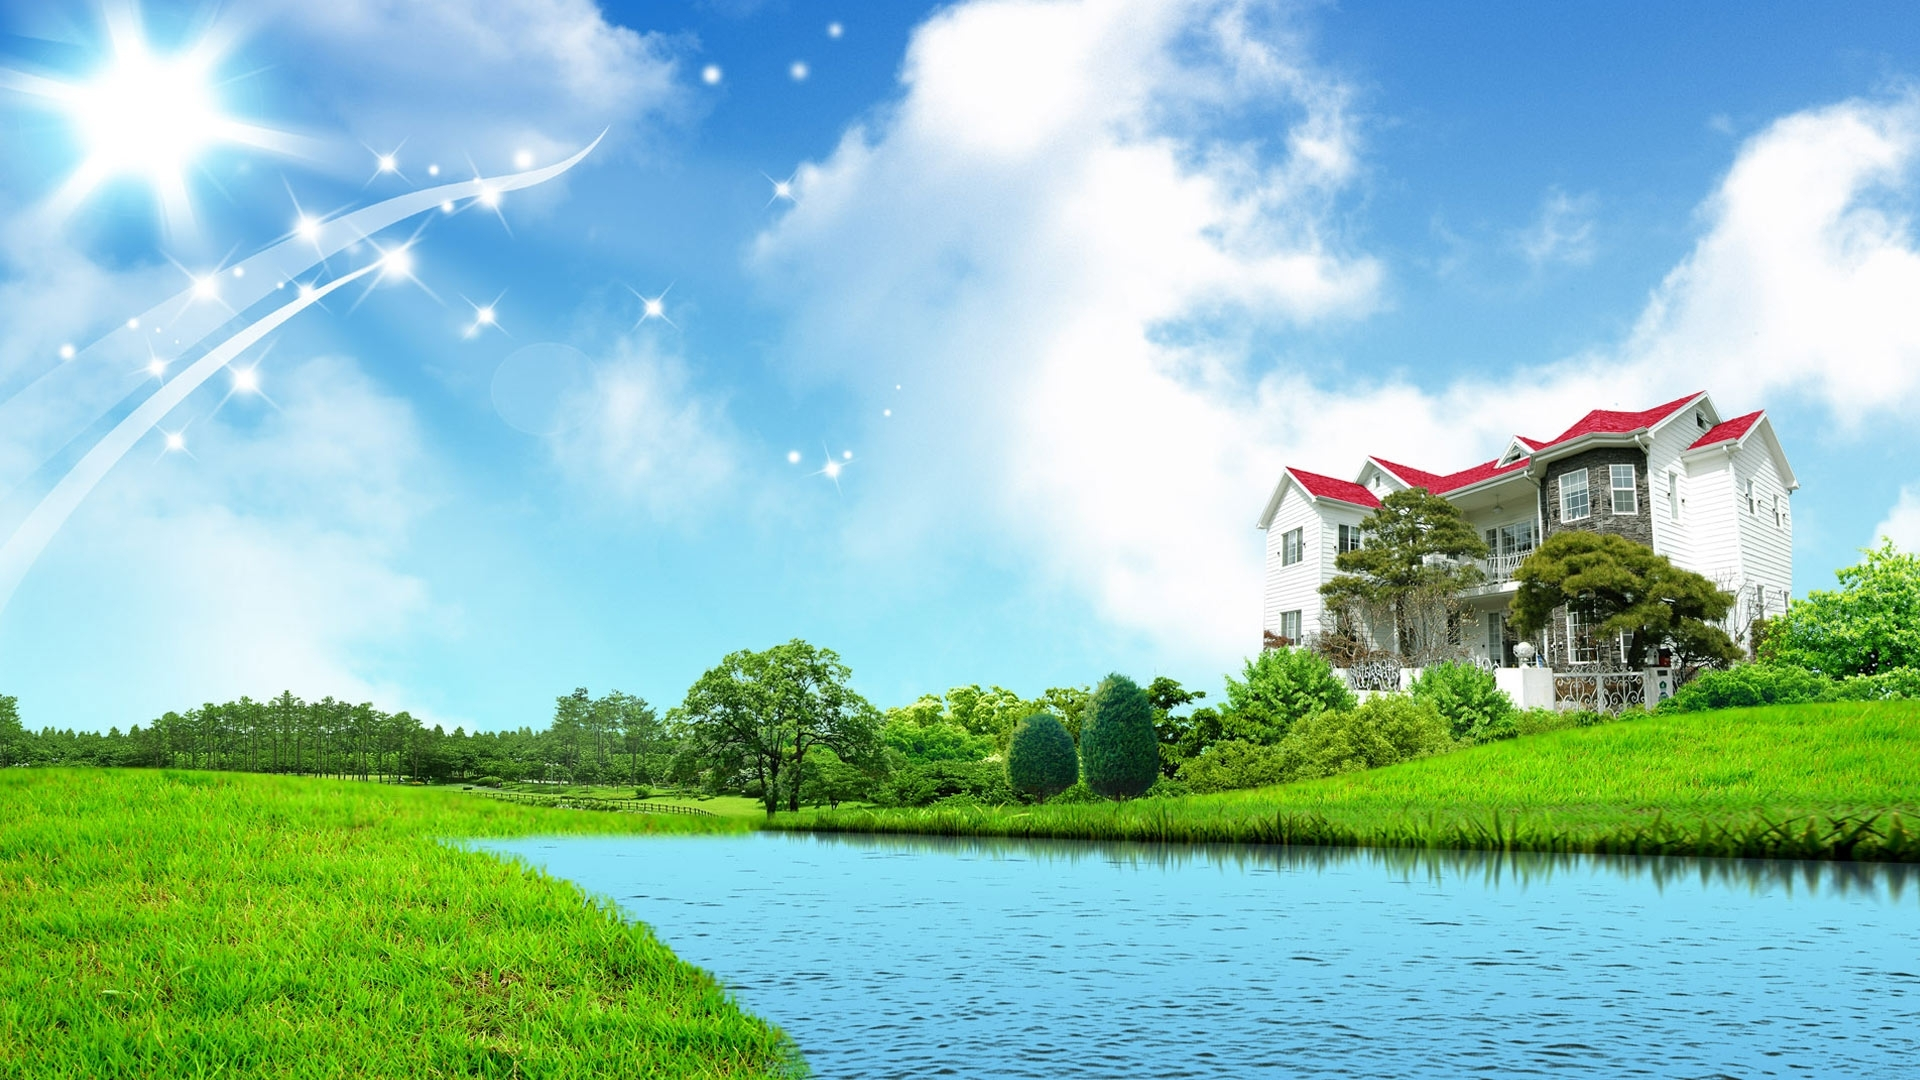 10 Best Pc Wallpaper Hd 1080p Nature Full Hd 1080p For Pc Desktop